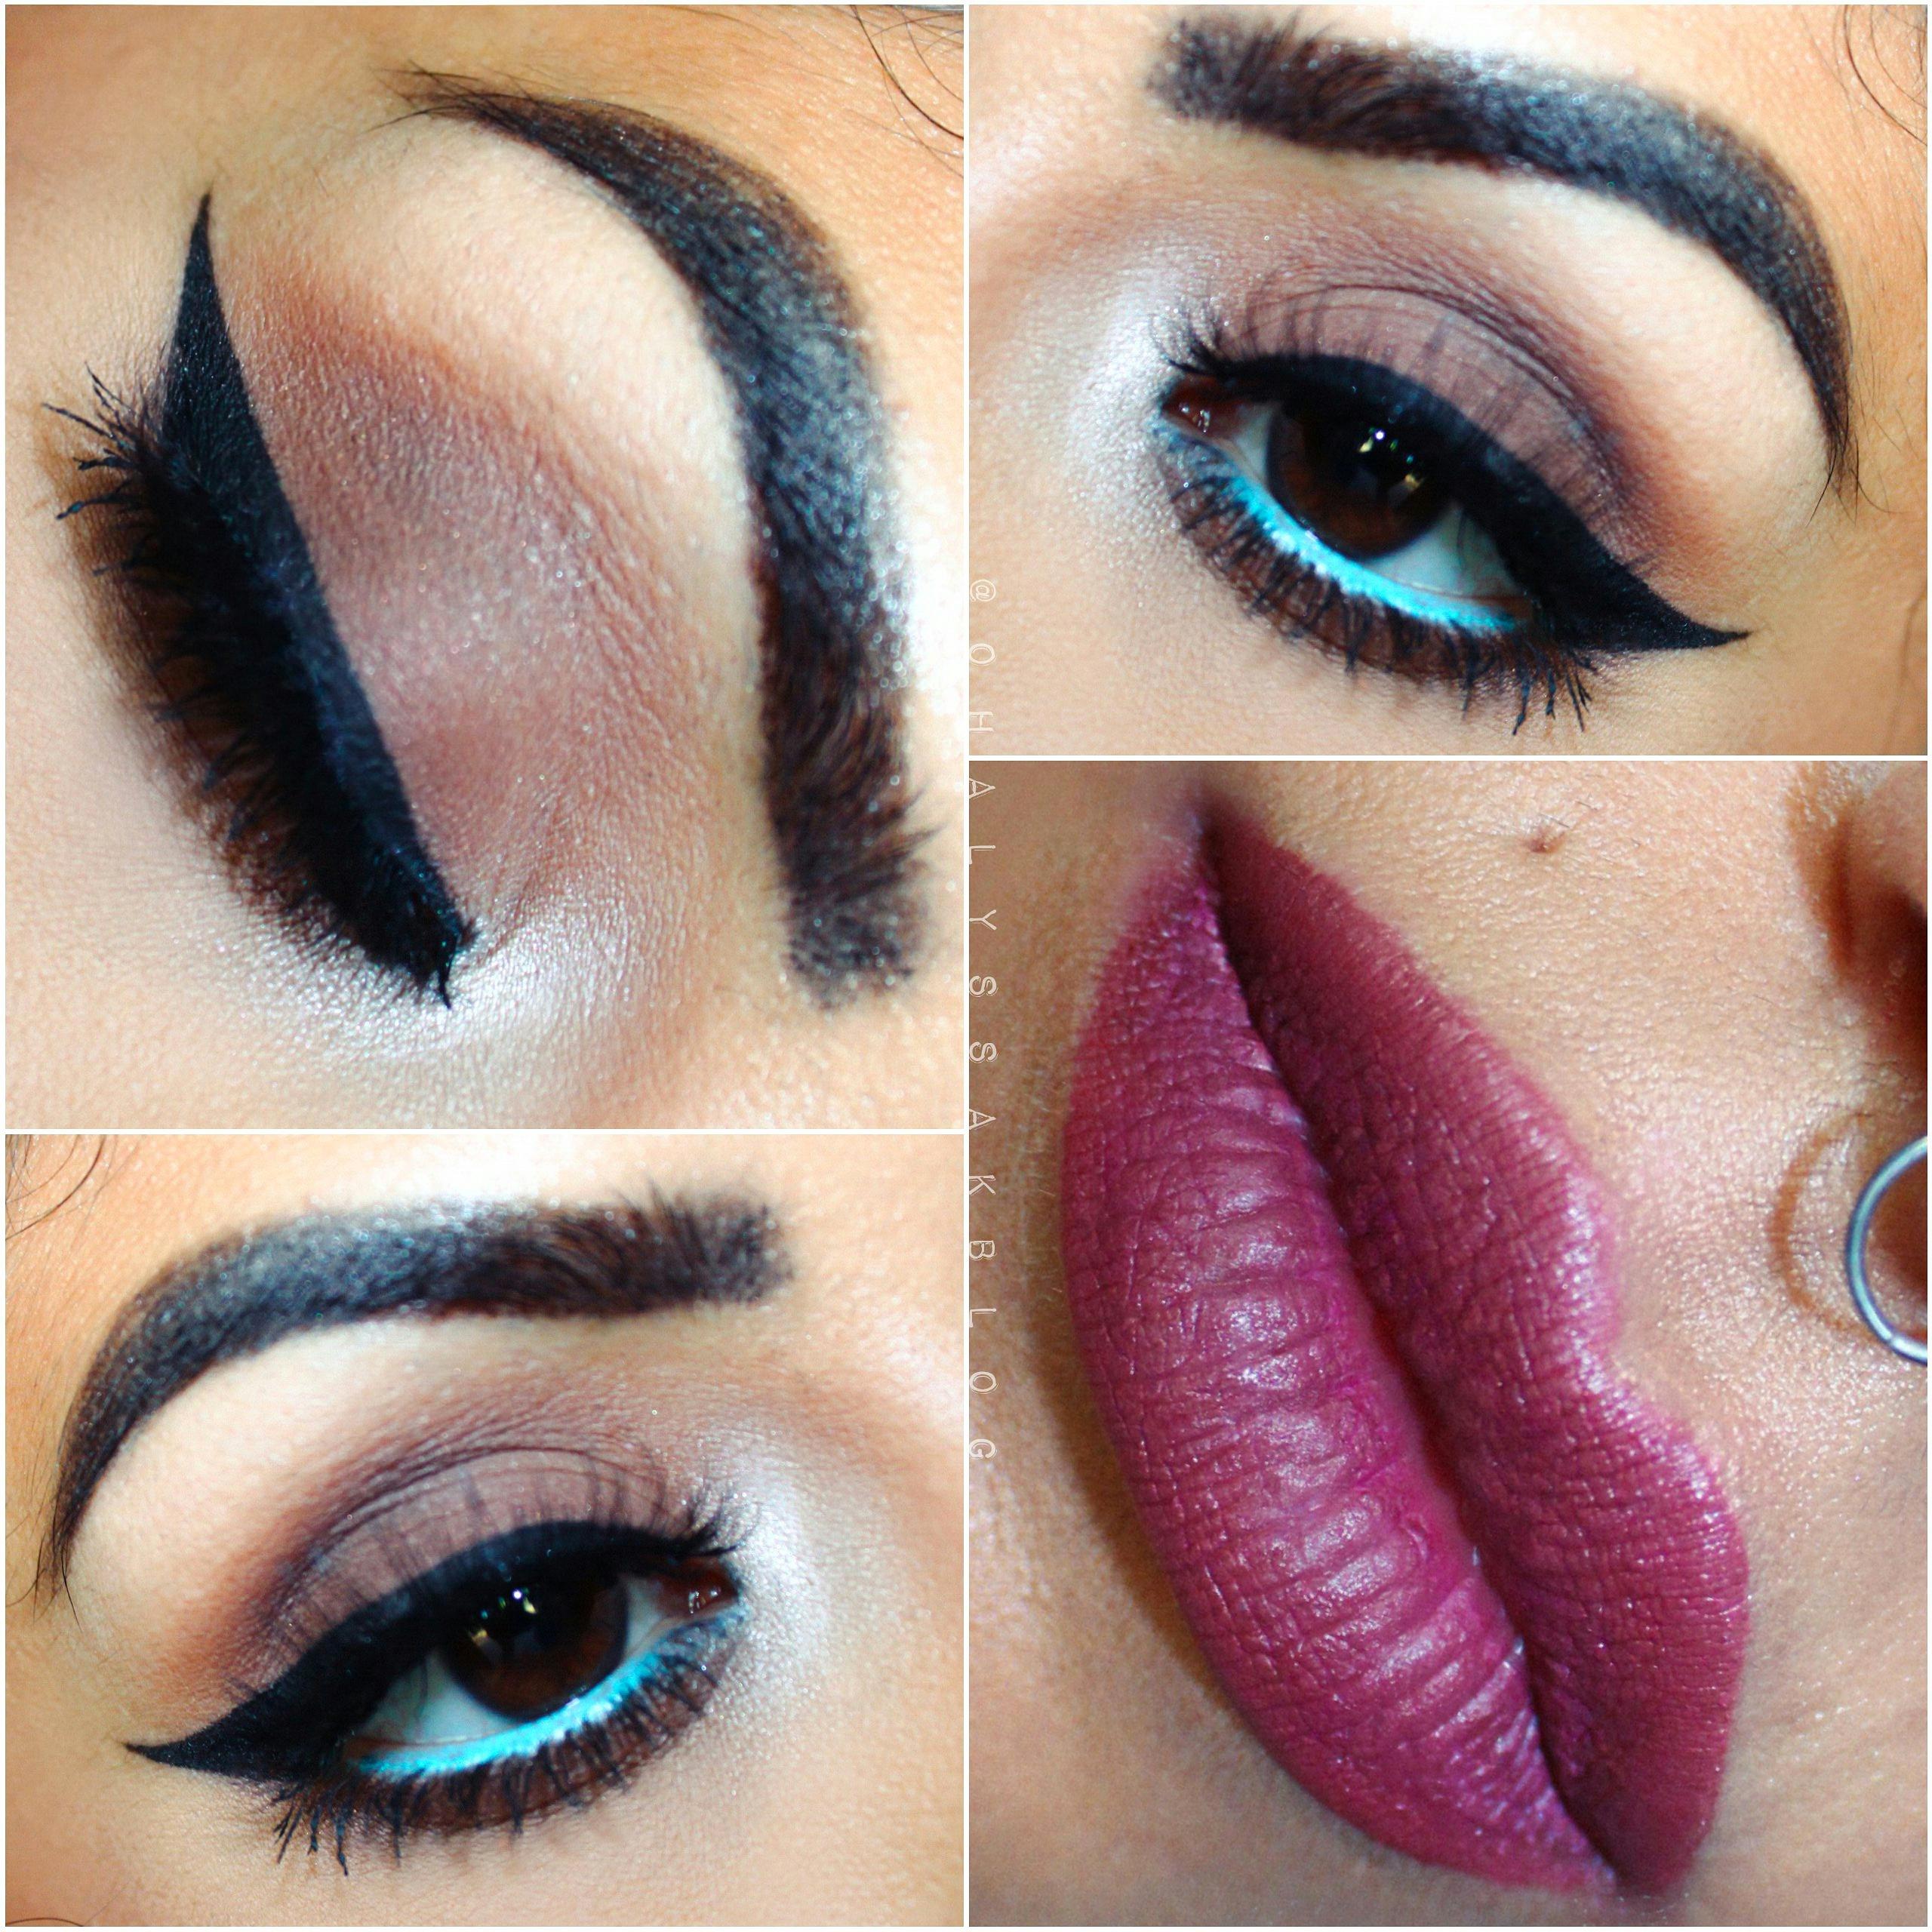 Morphe Eye Pencil Aqua Liner Summer Makeup Makeup Geek Cosmetics Single Shadows MUG Barcelona  Beach MUG Hipster Jeffree Star Androgyny Ardell Lashes Best Liquid Lipstick